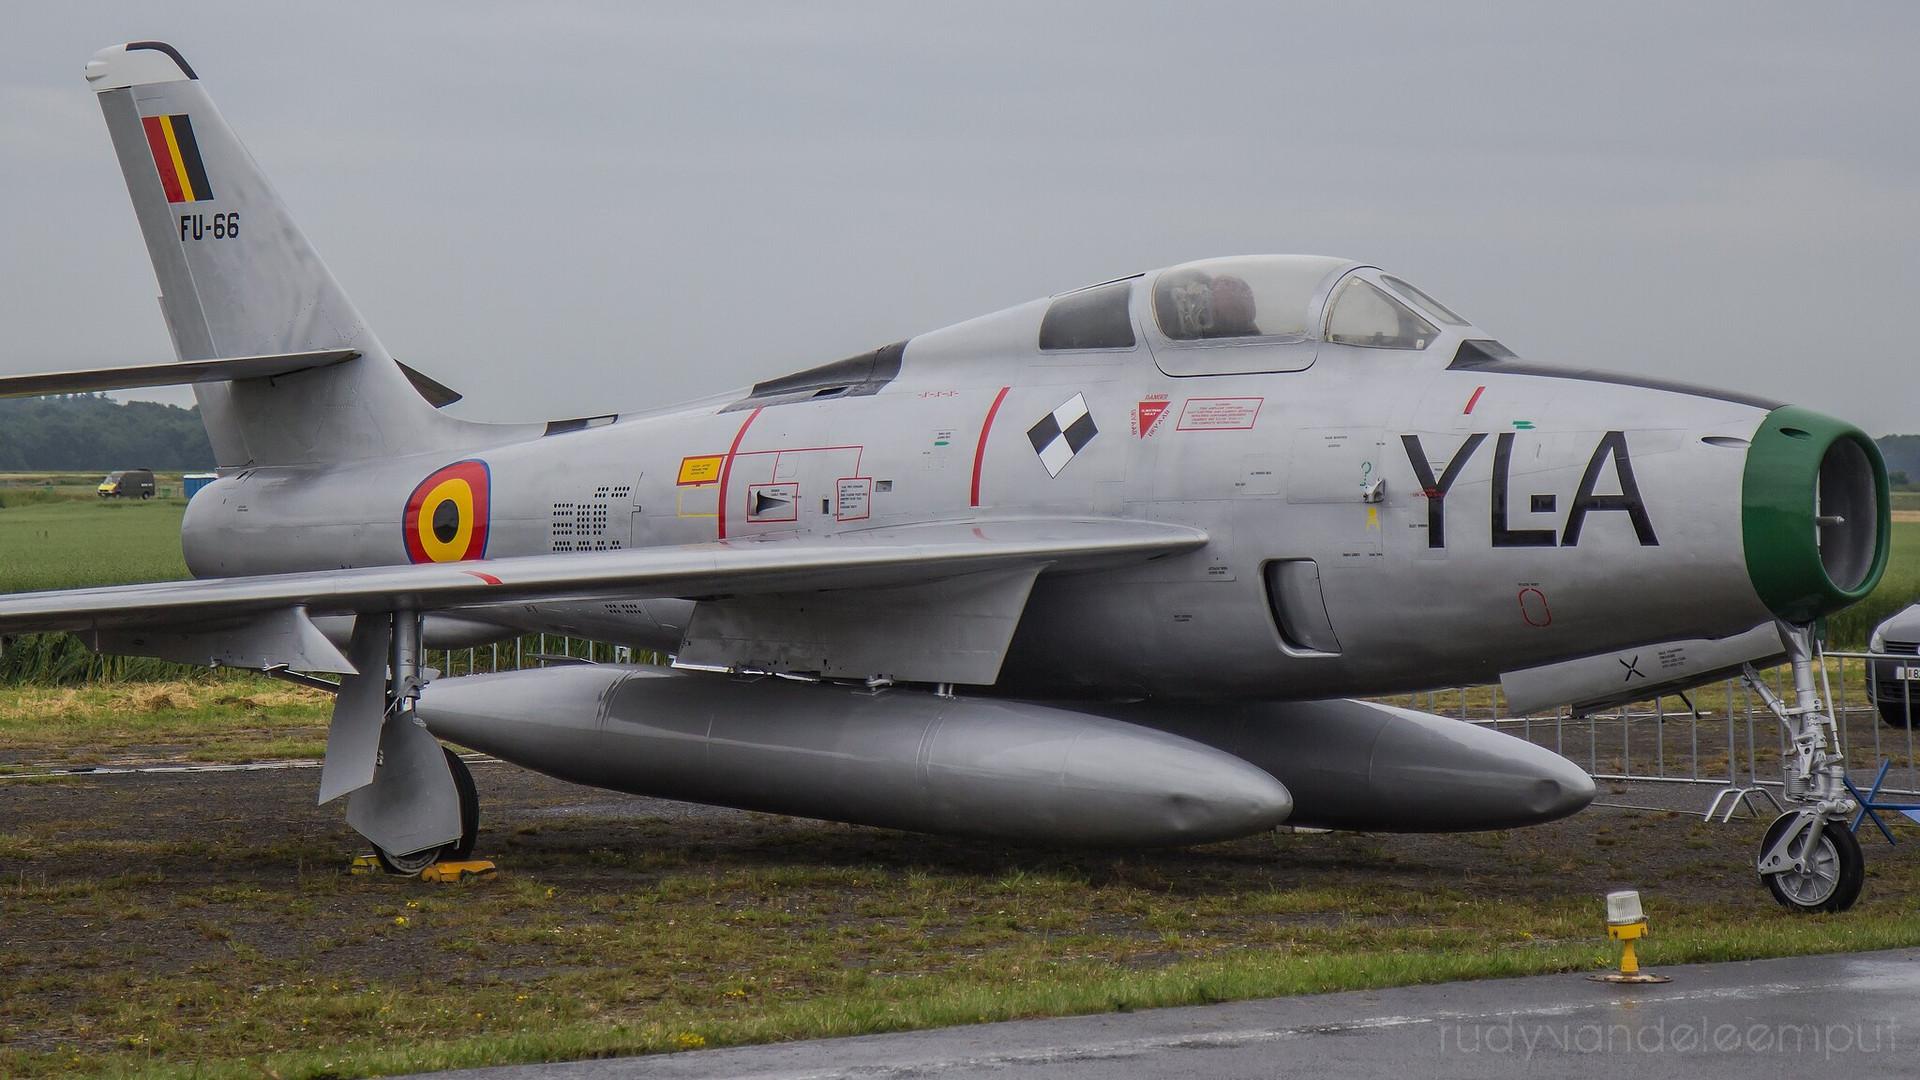 FU-66 | Build: .... - Republic F-84F Thunderstreak